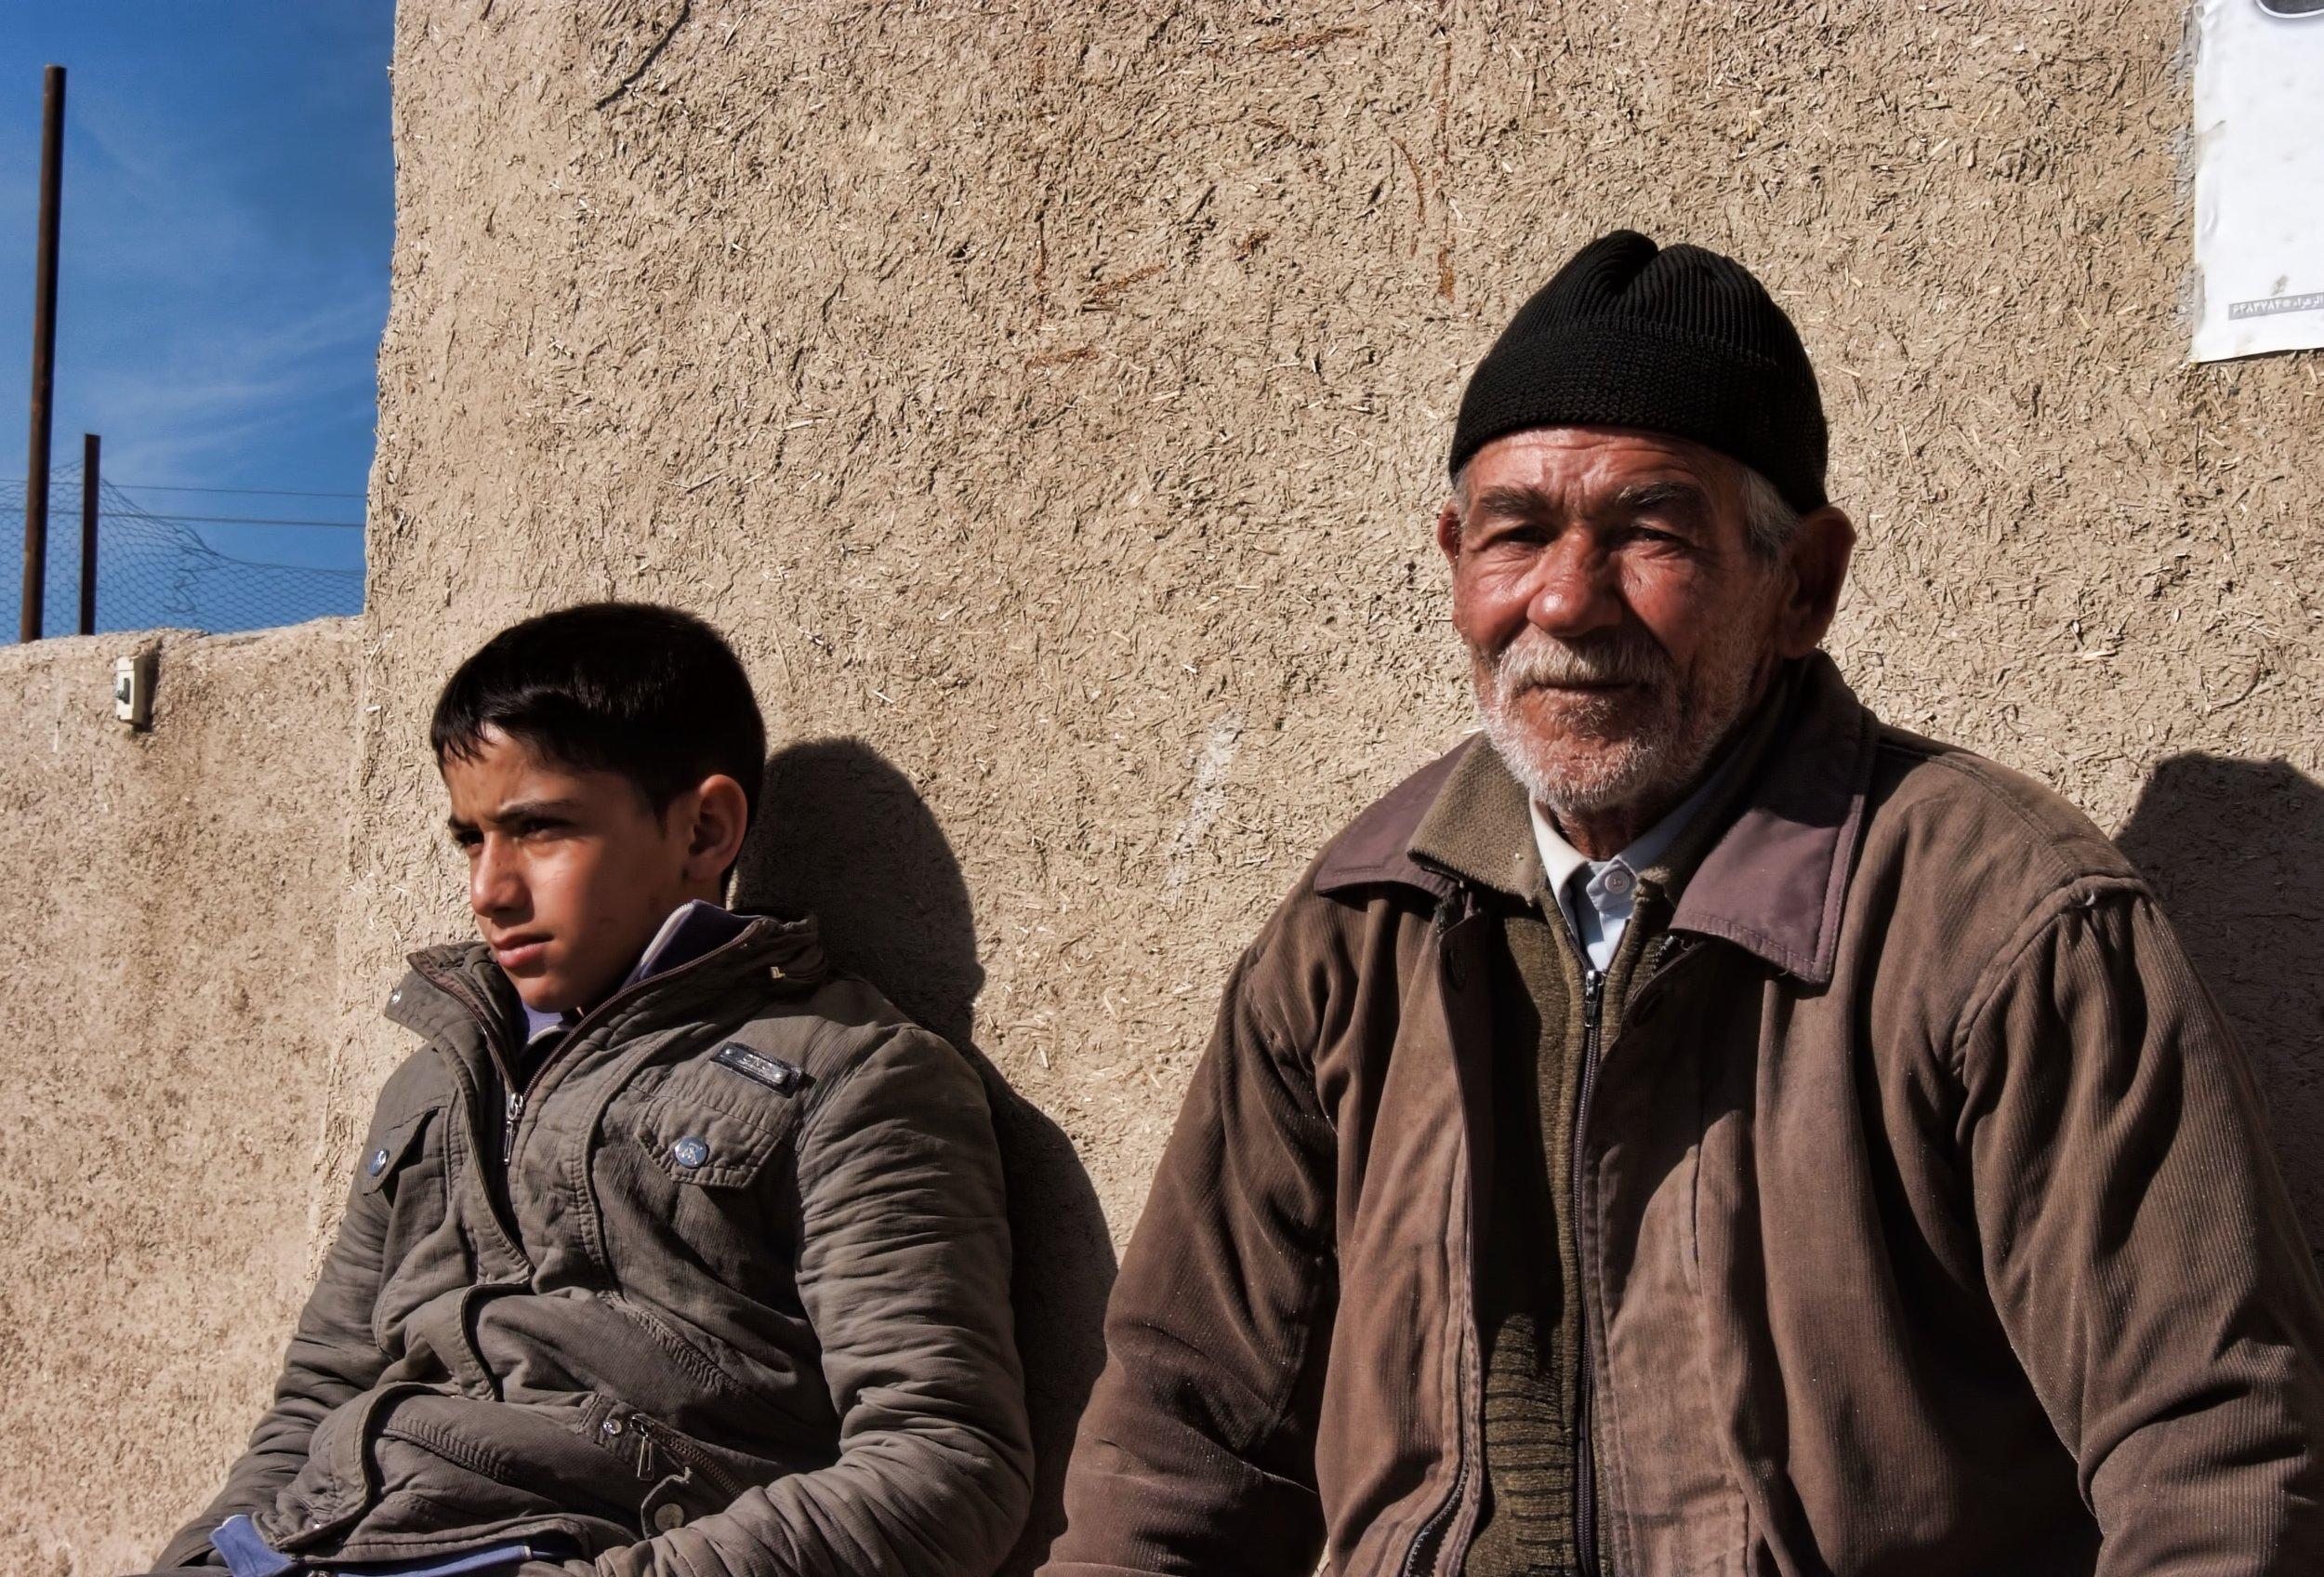 A grandfather and son Isfahan, Iran